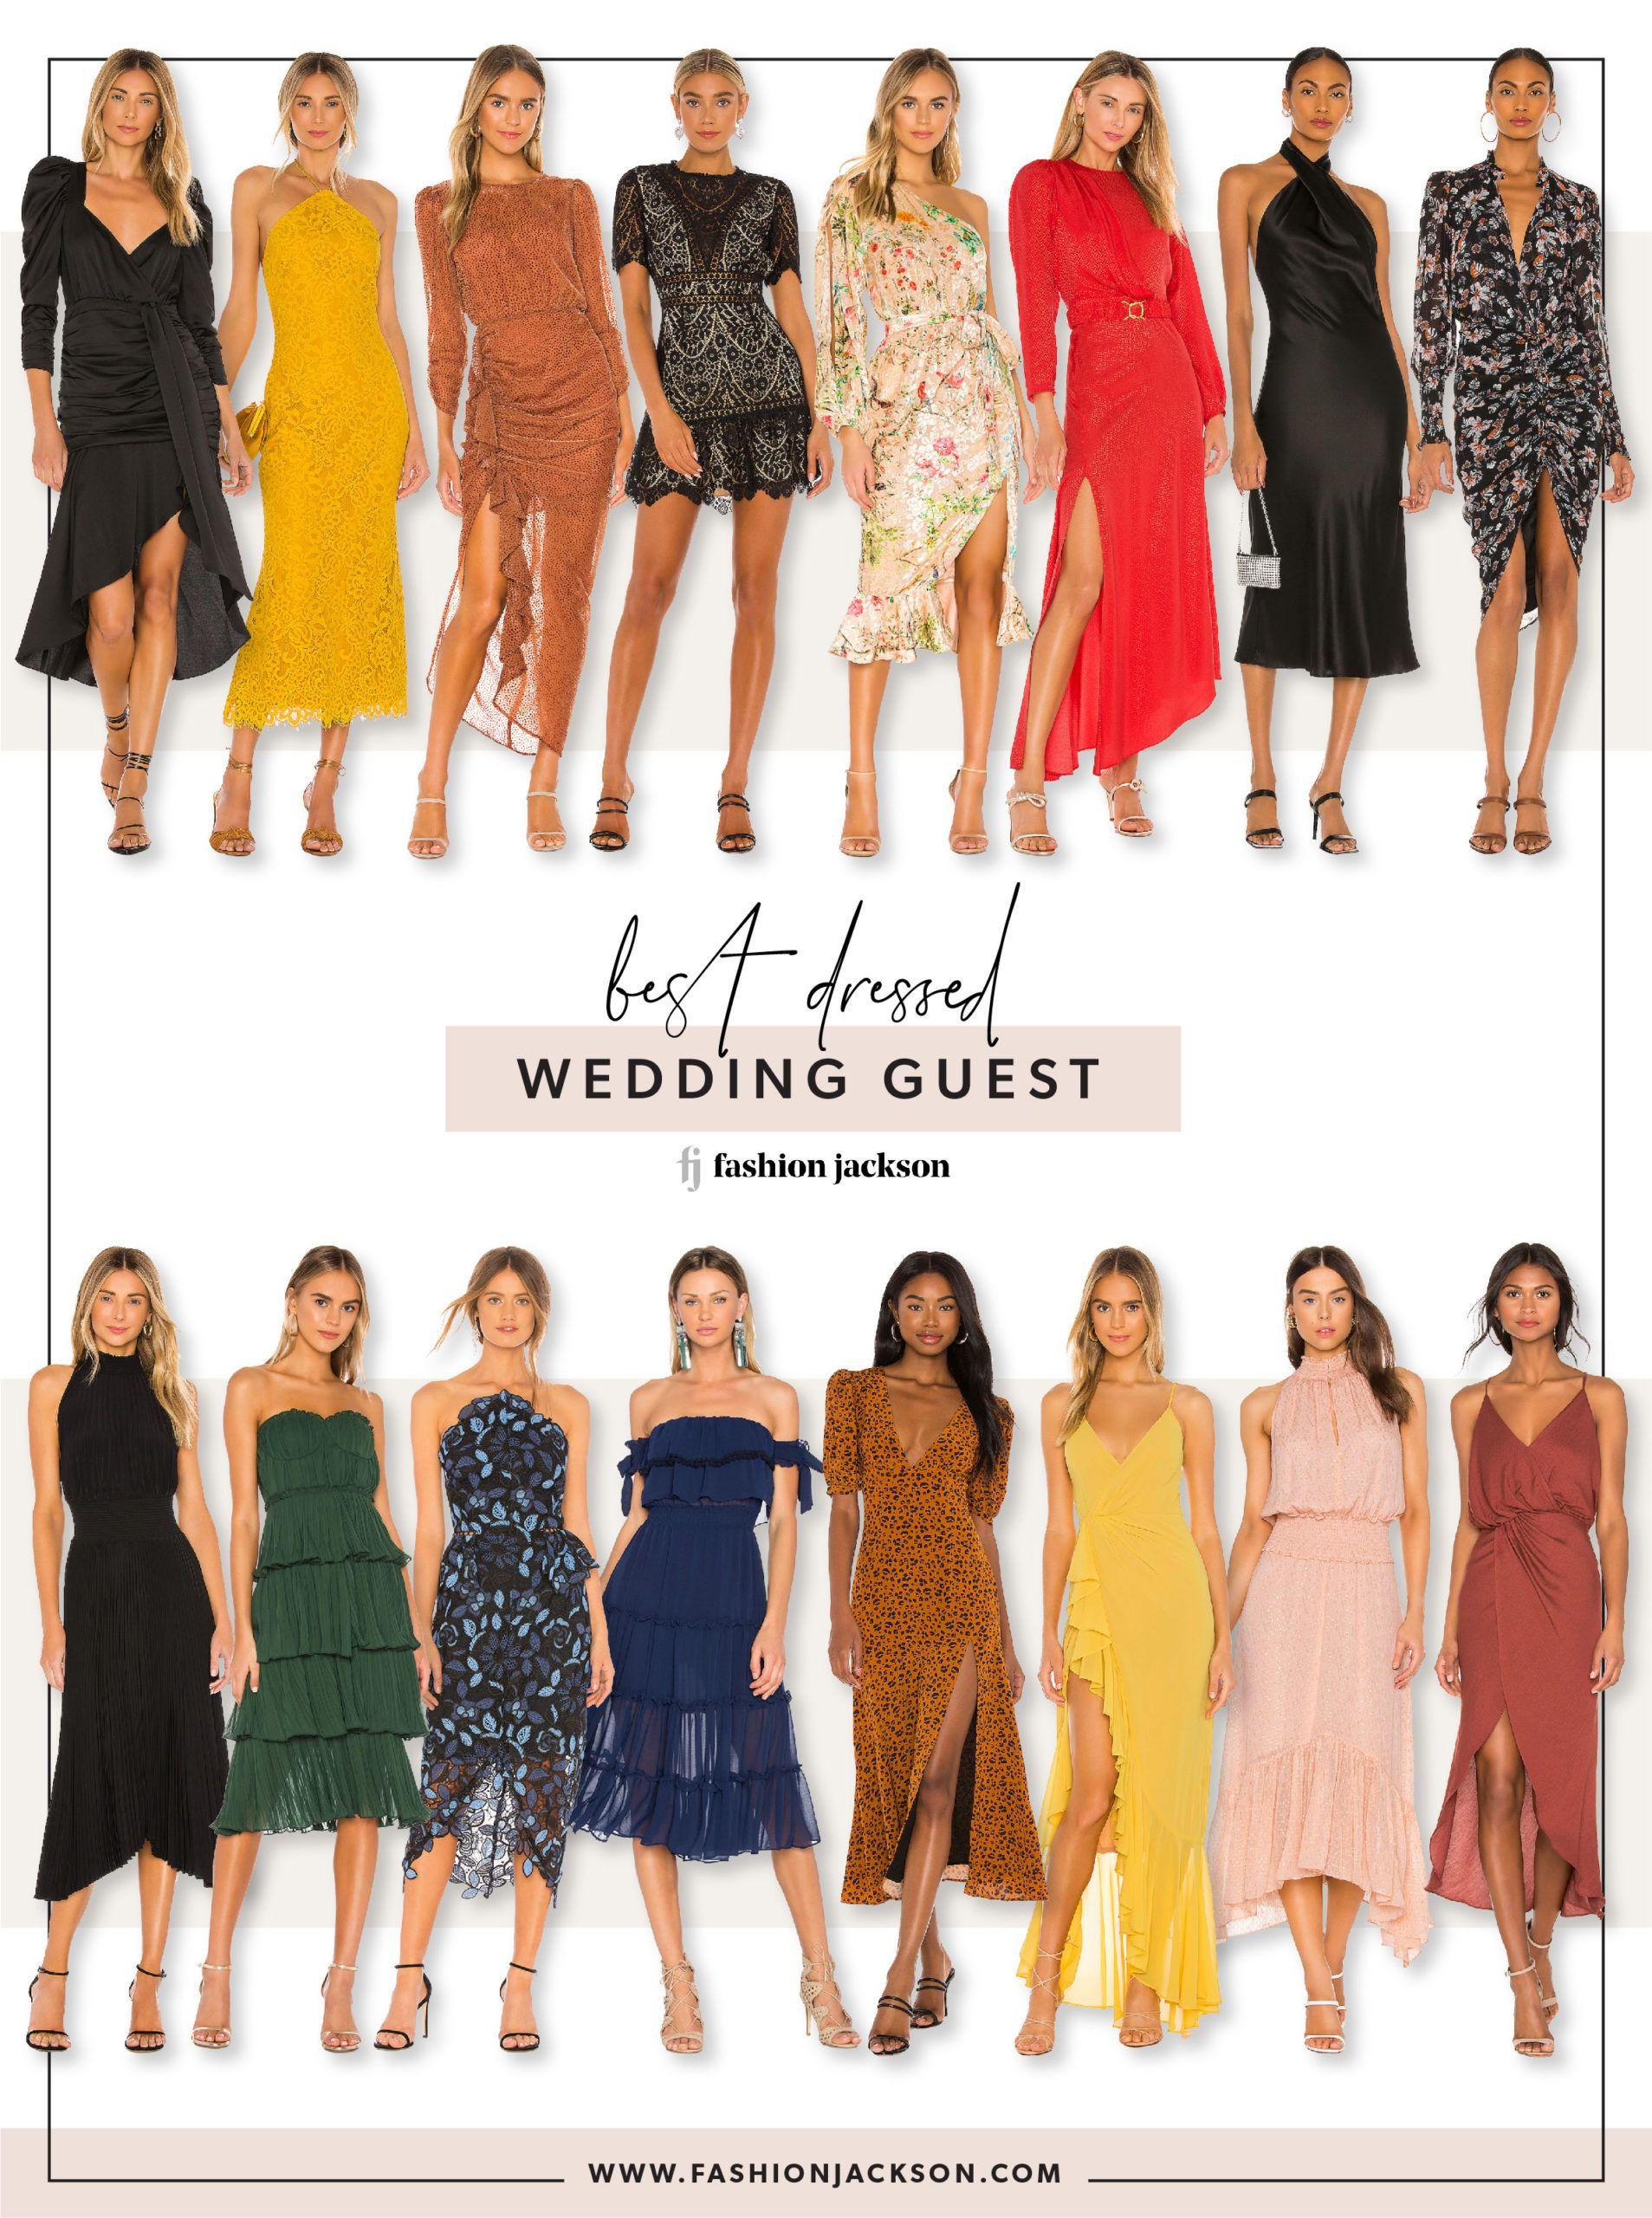 fall wedding guest dresses   Fall wedding guest dress, Wedding ...